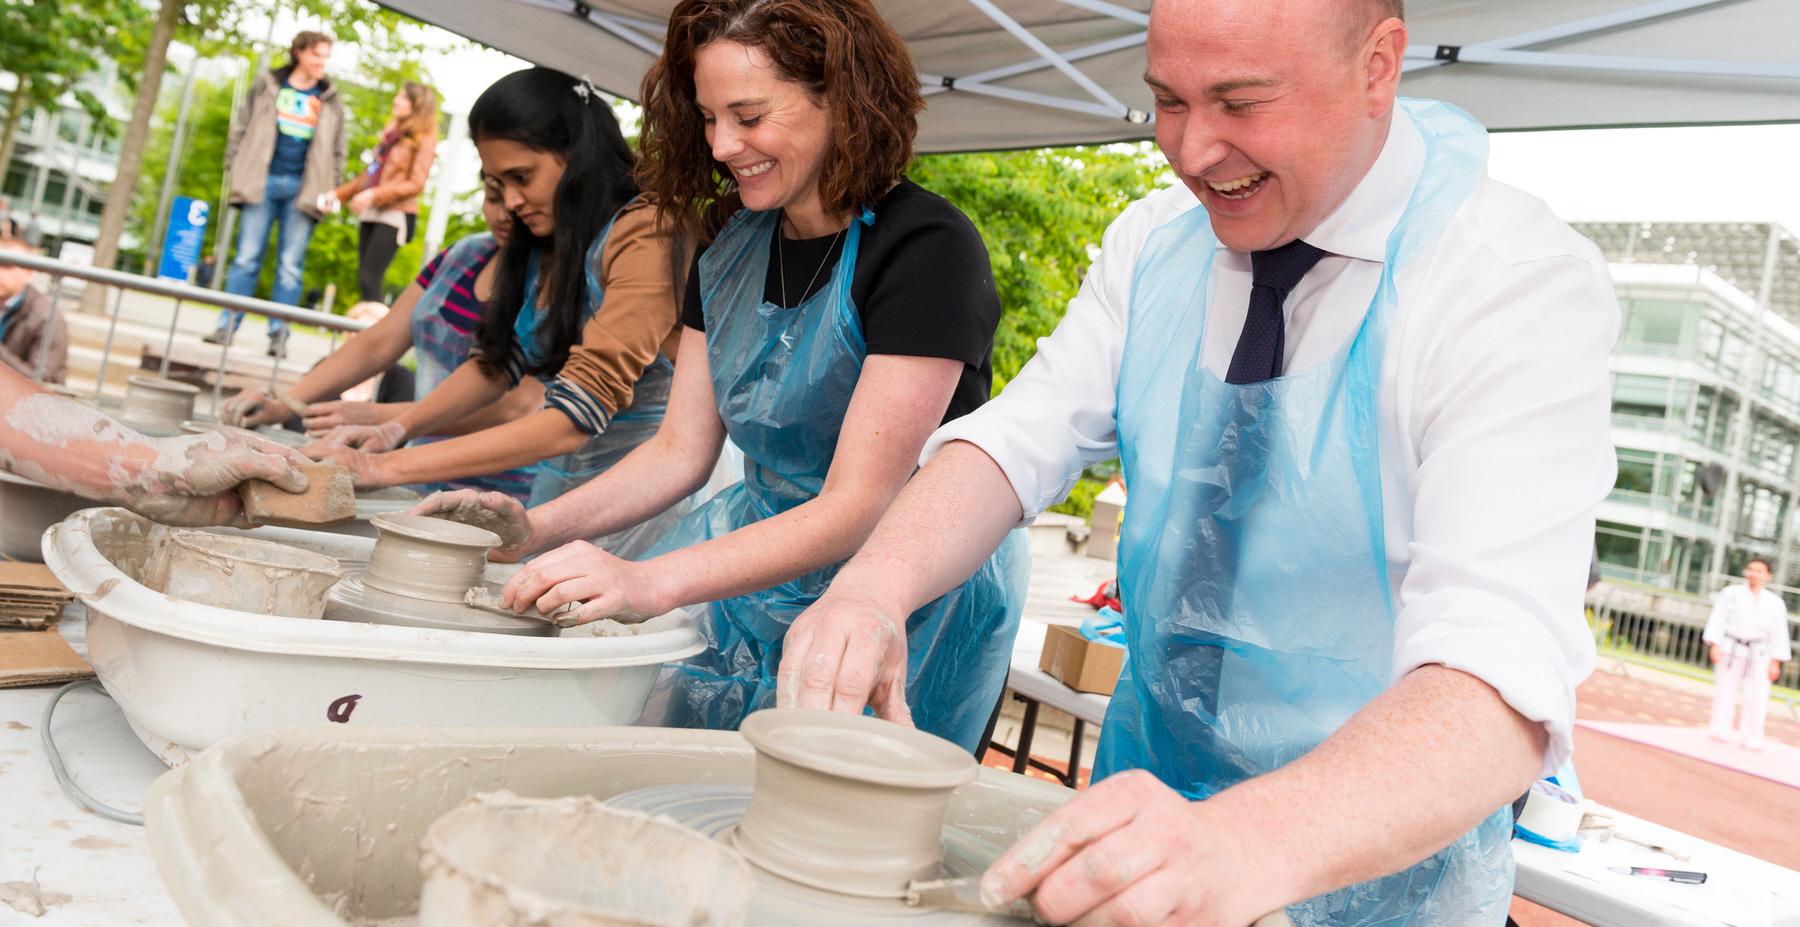 Enjoy Work Pottery Day